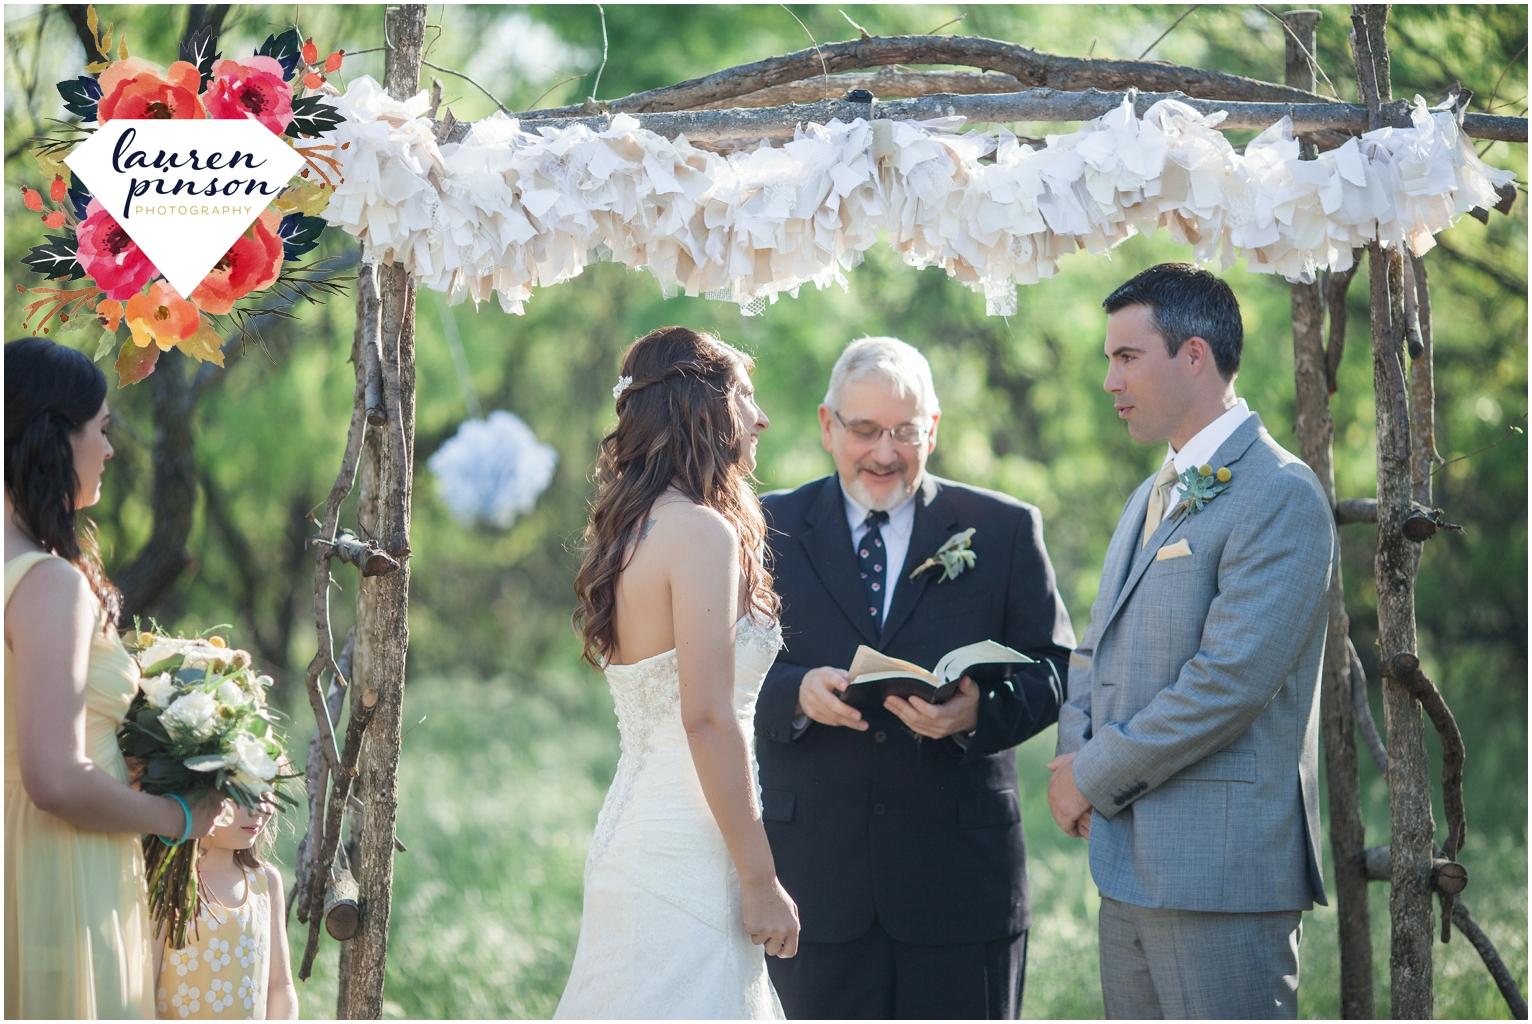 wichita-falls-wedding-photographer-oklahoma-wichita-mountains-bridal-session-bridals-photography_0737.jpg